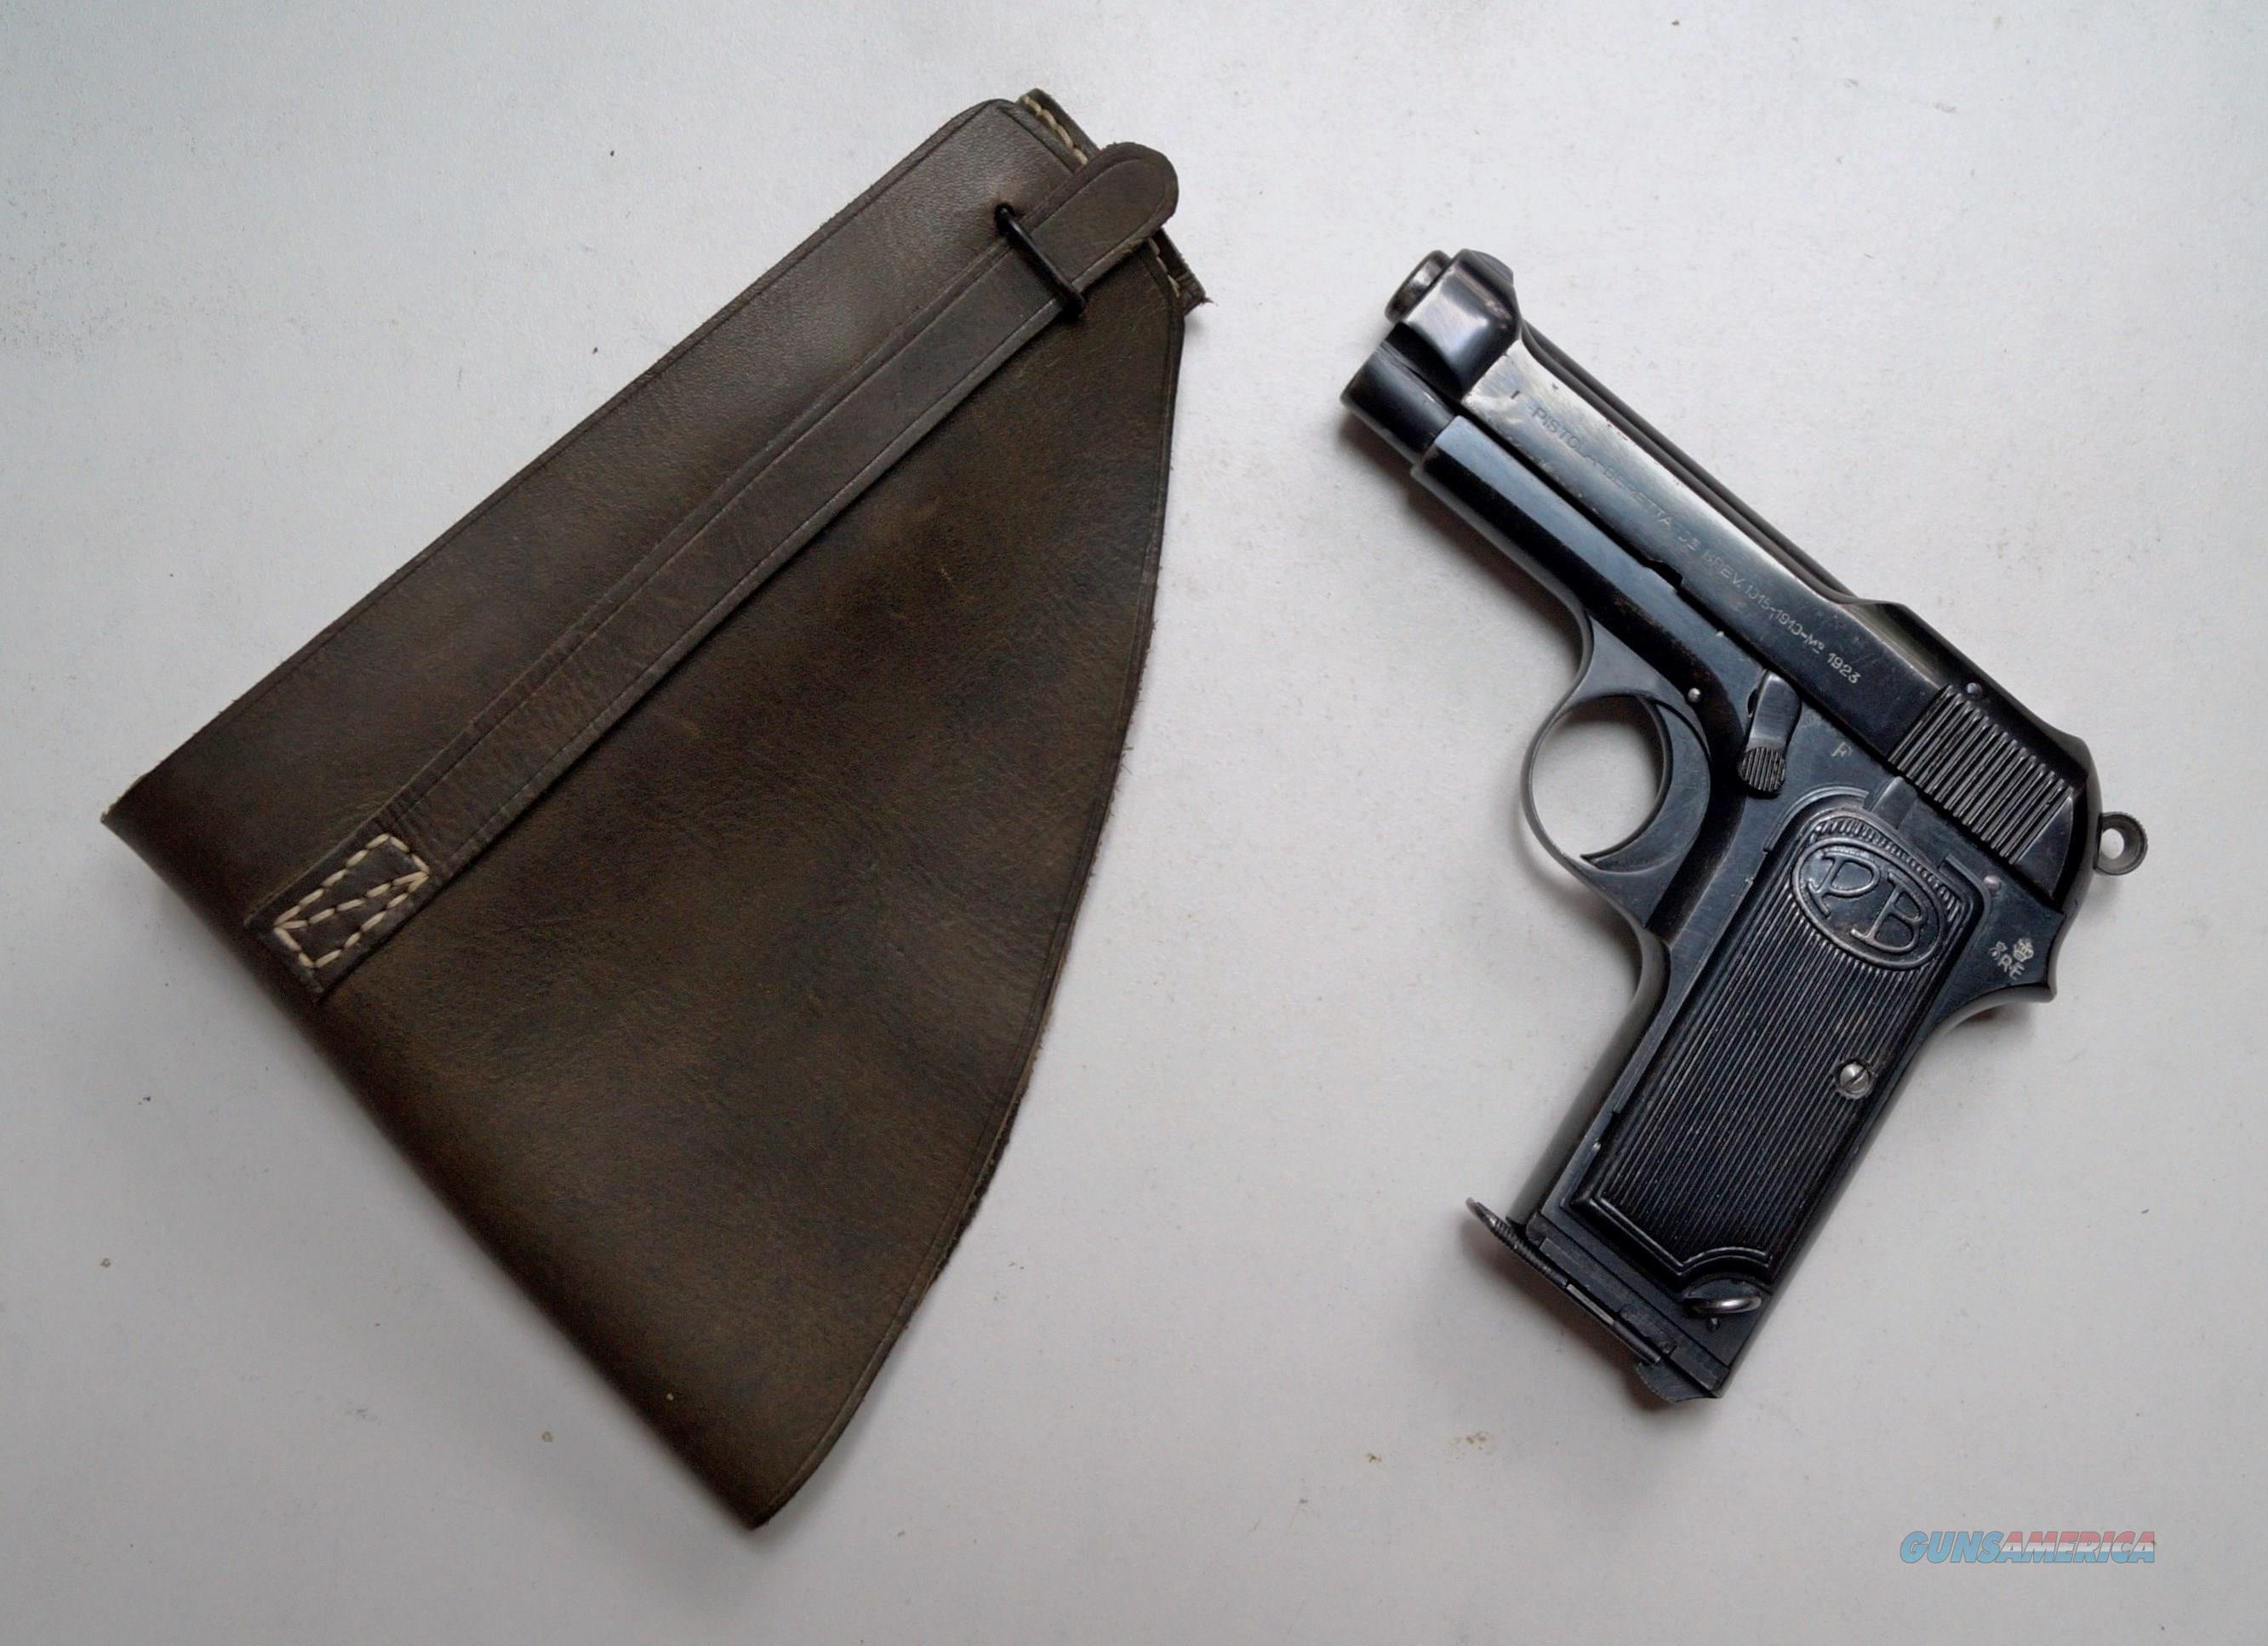 BERETTA MODEL 1923 -SLOTTED FOR SHOULDER STOCK  Guns > Pistols > Beretta Pistols > Rare & Collectible